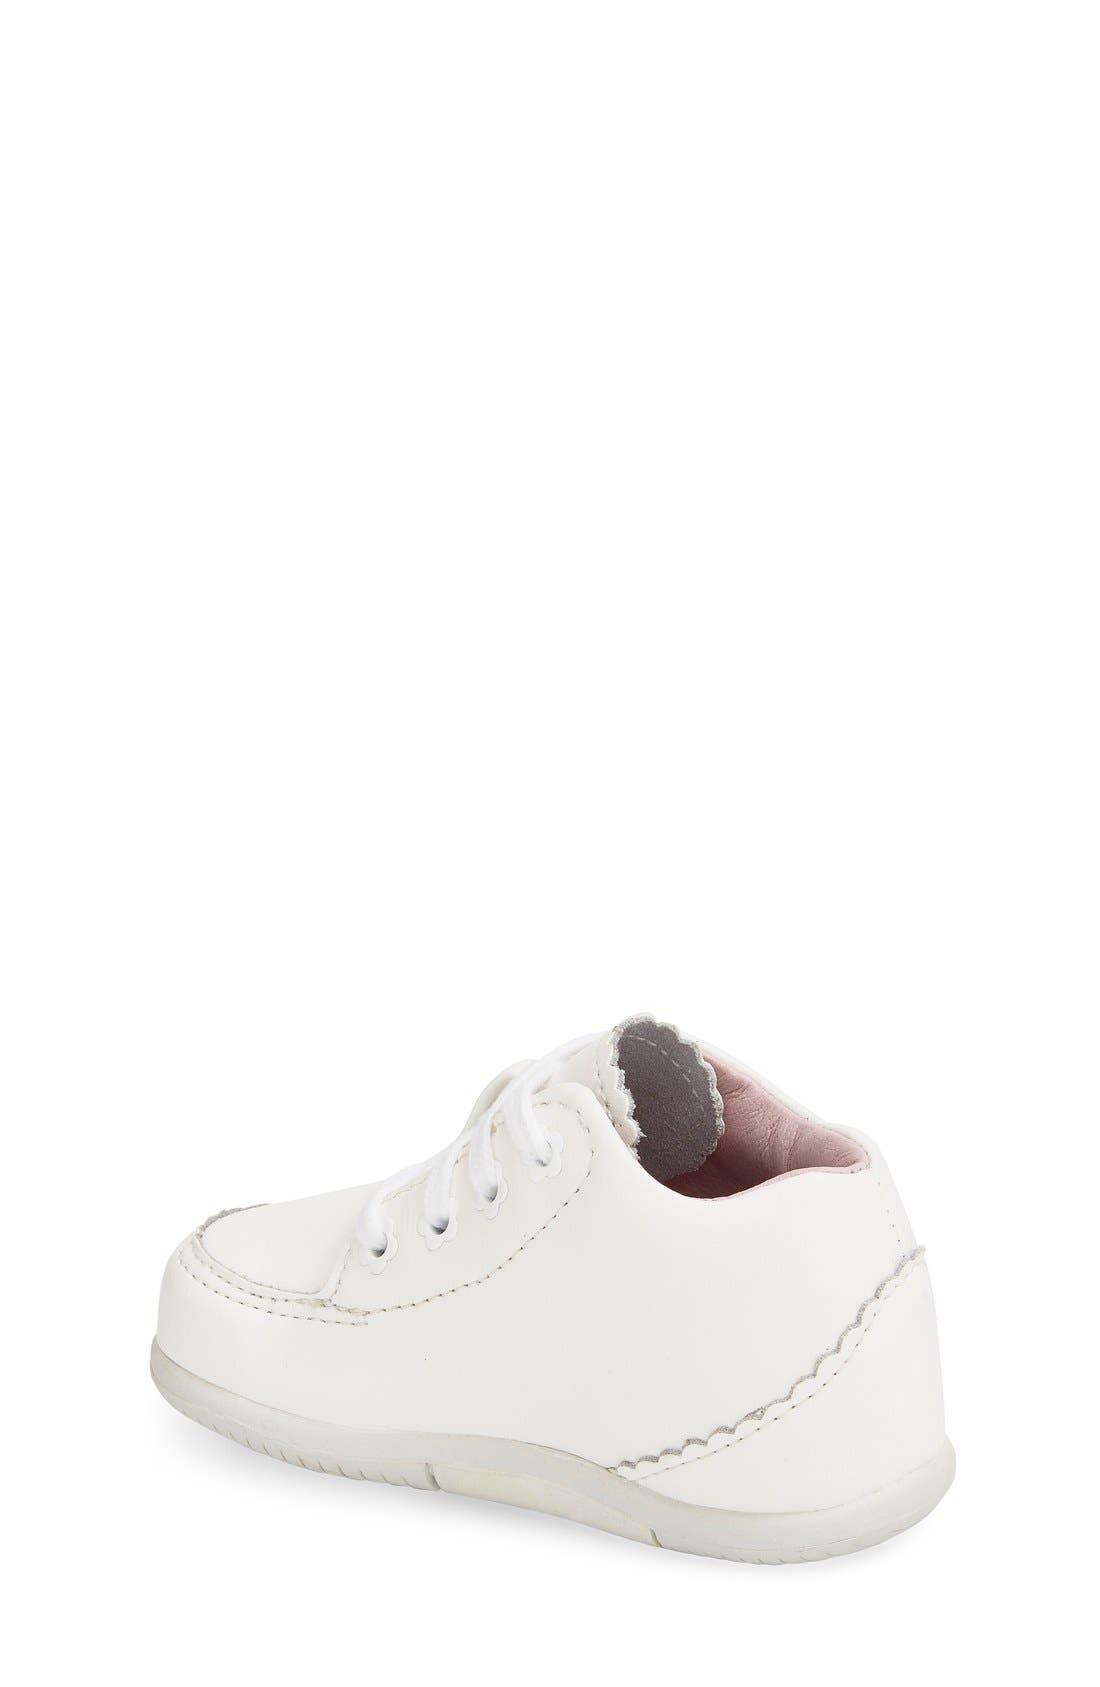 'Emilia' Leather Boot,                             Alternate thumbnail 2, color,                             WHITE